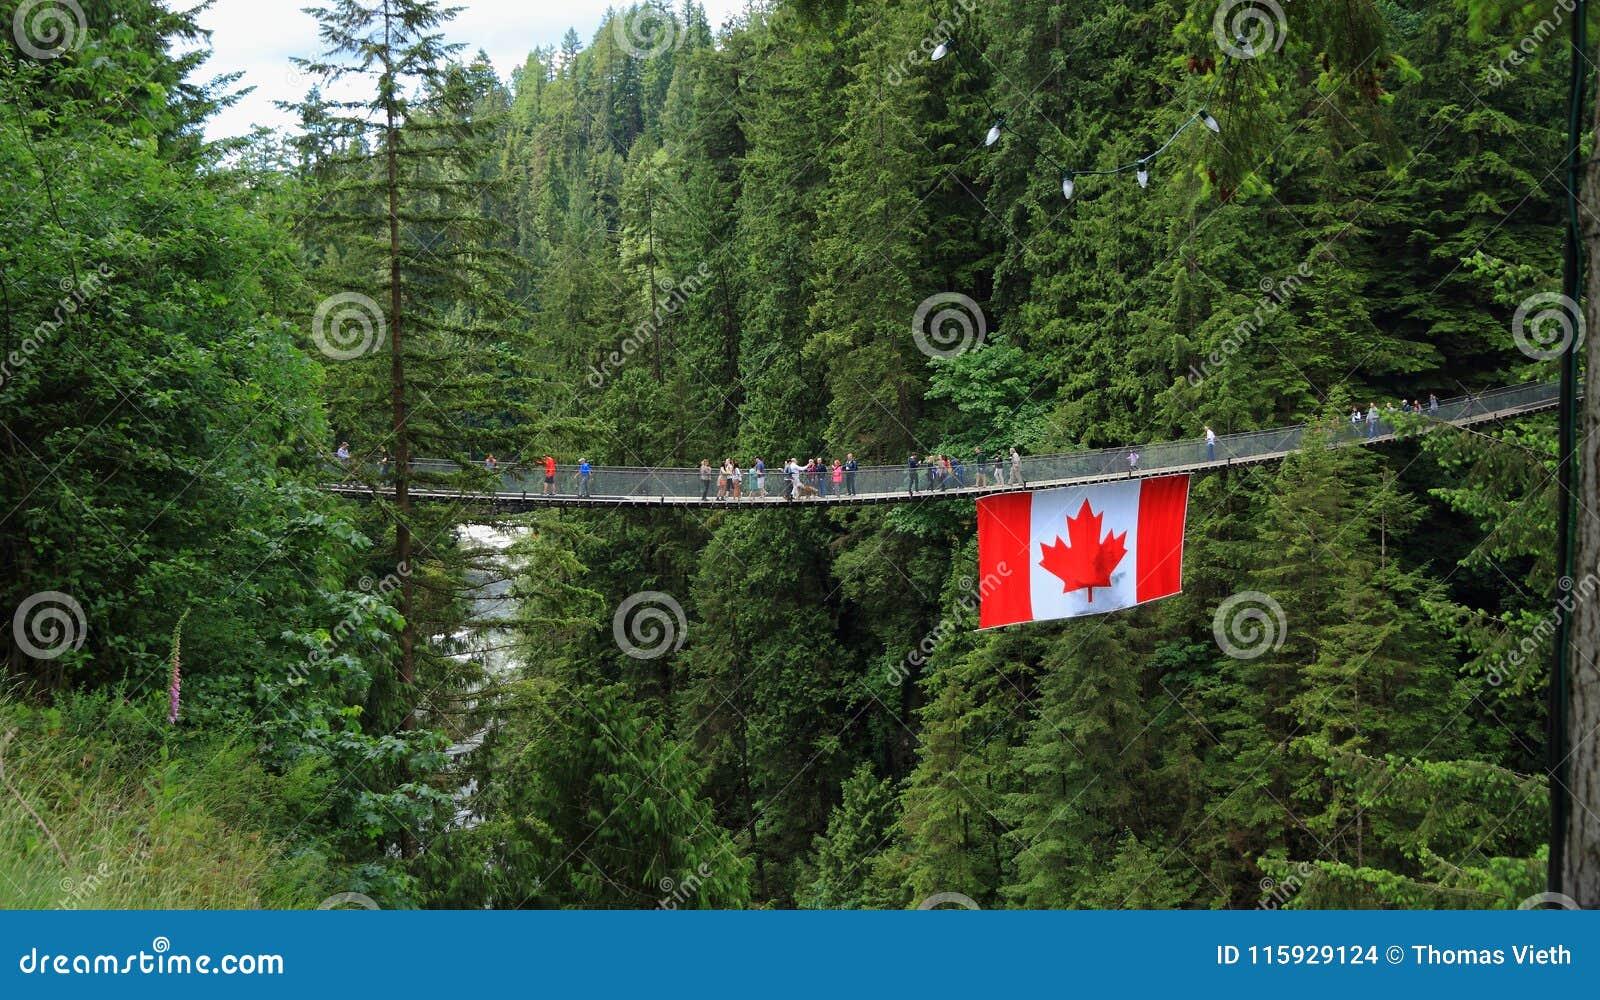 Vancouver, Kanada: Tourismus - Capilano-Hängebrücke mit kanadischer Flagge